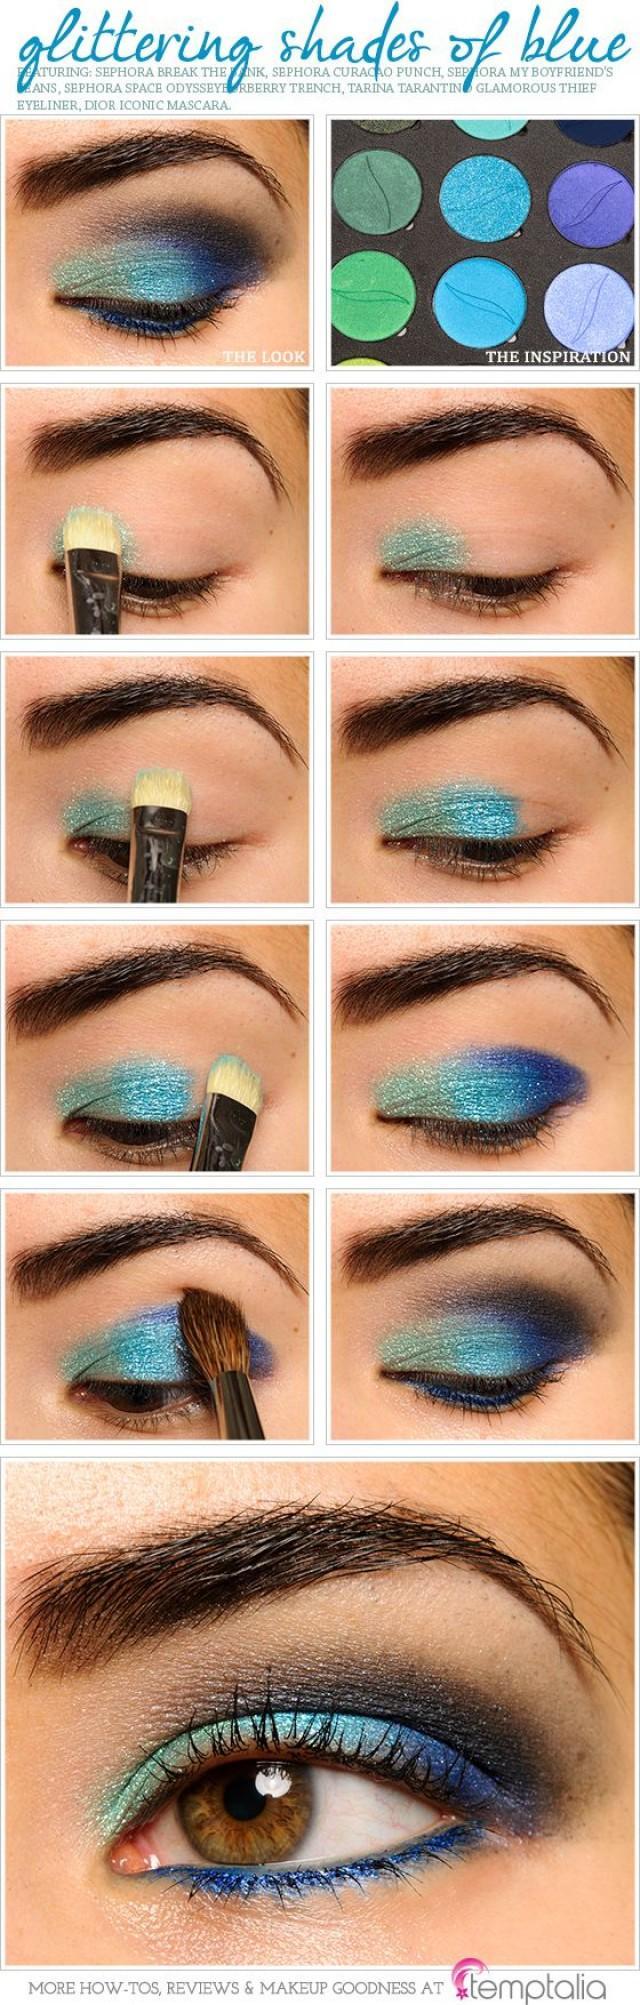 Best Wedding Makeup Sephora : Sephora Break The Bank (11) Eyeshadow Review, Photos ...